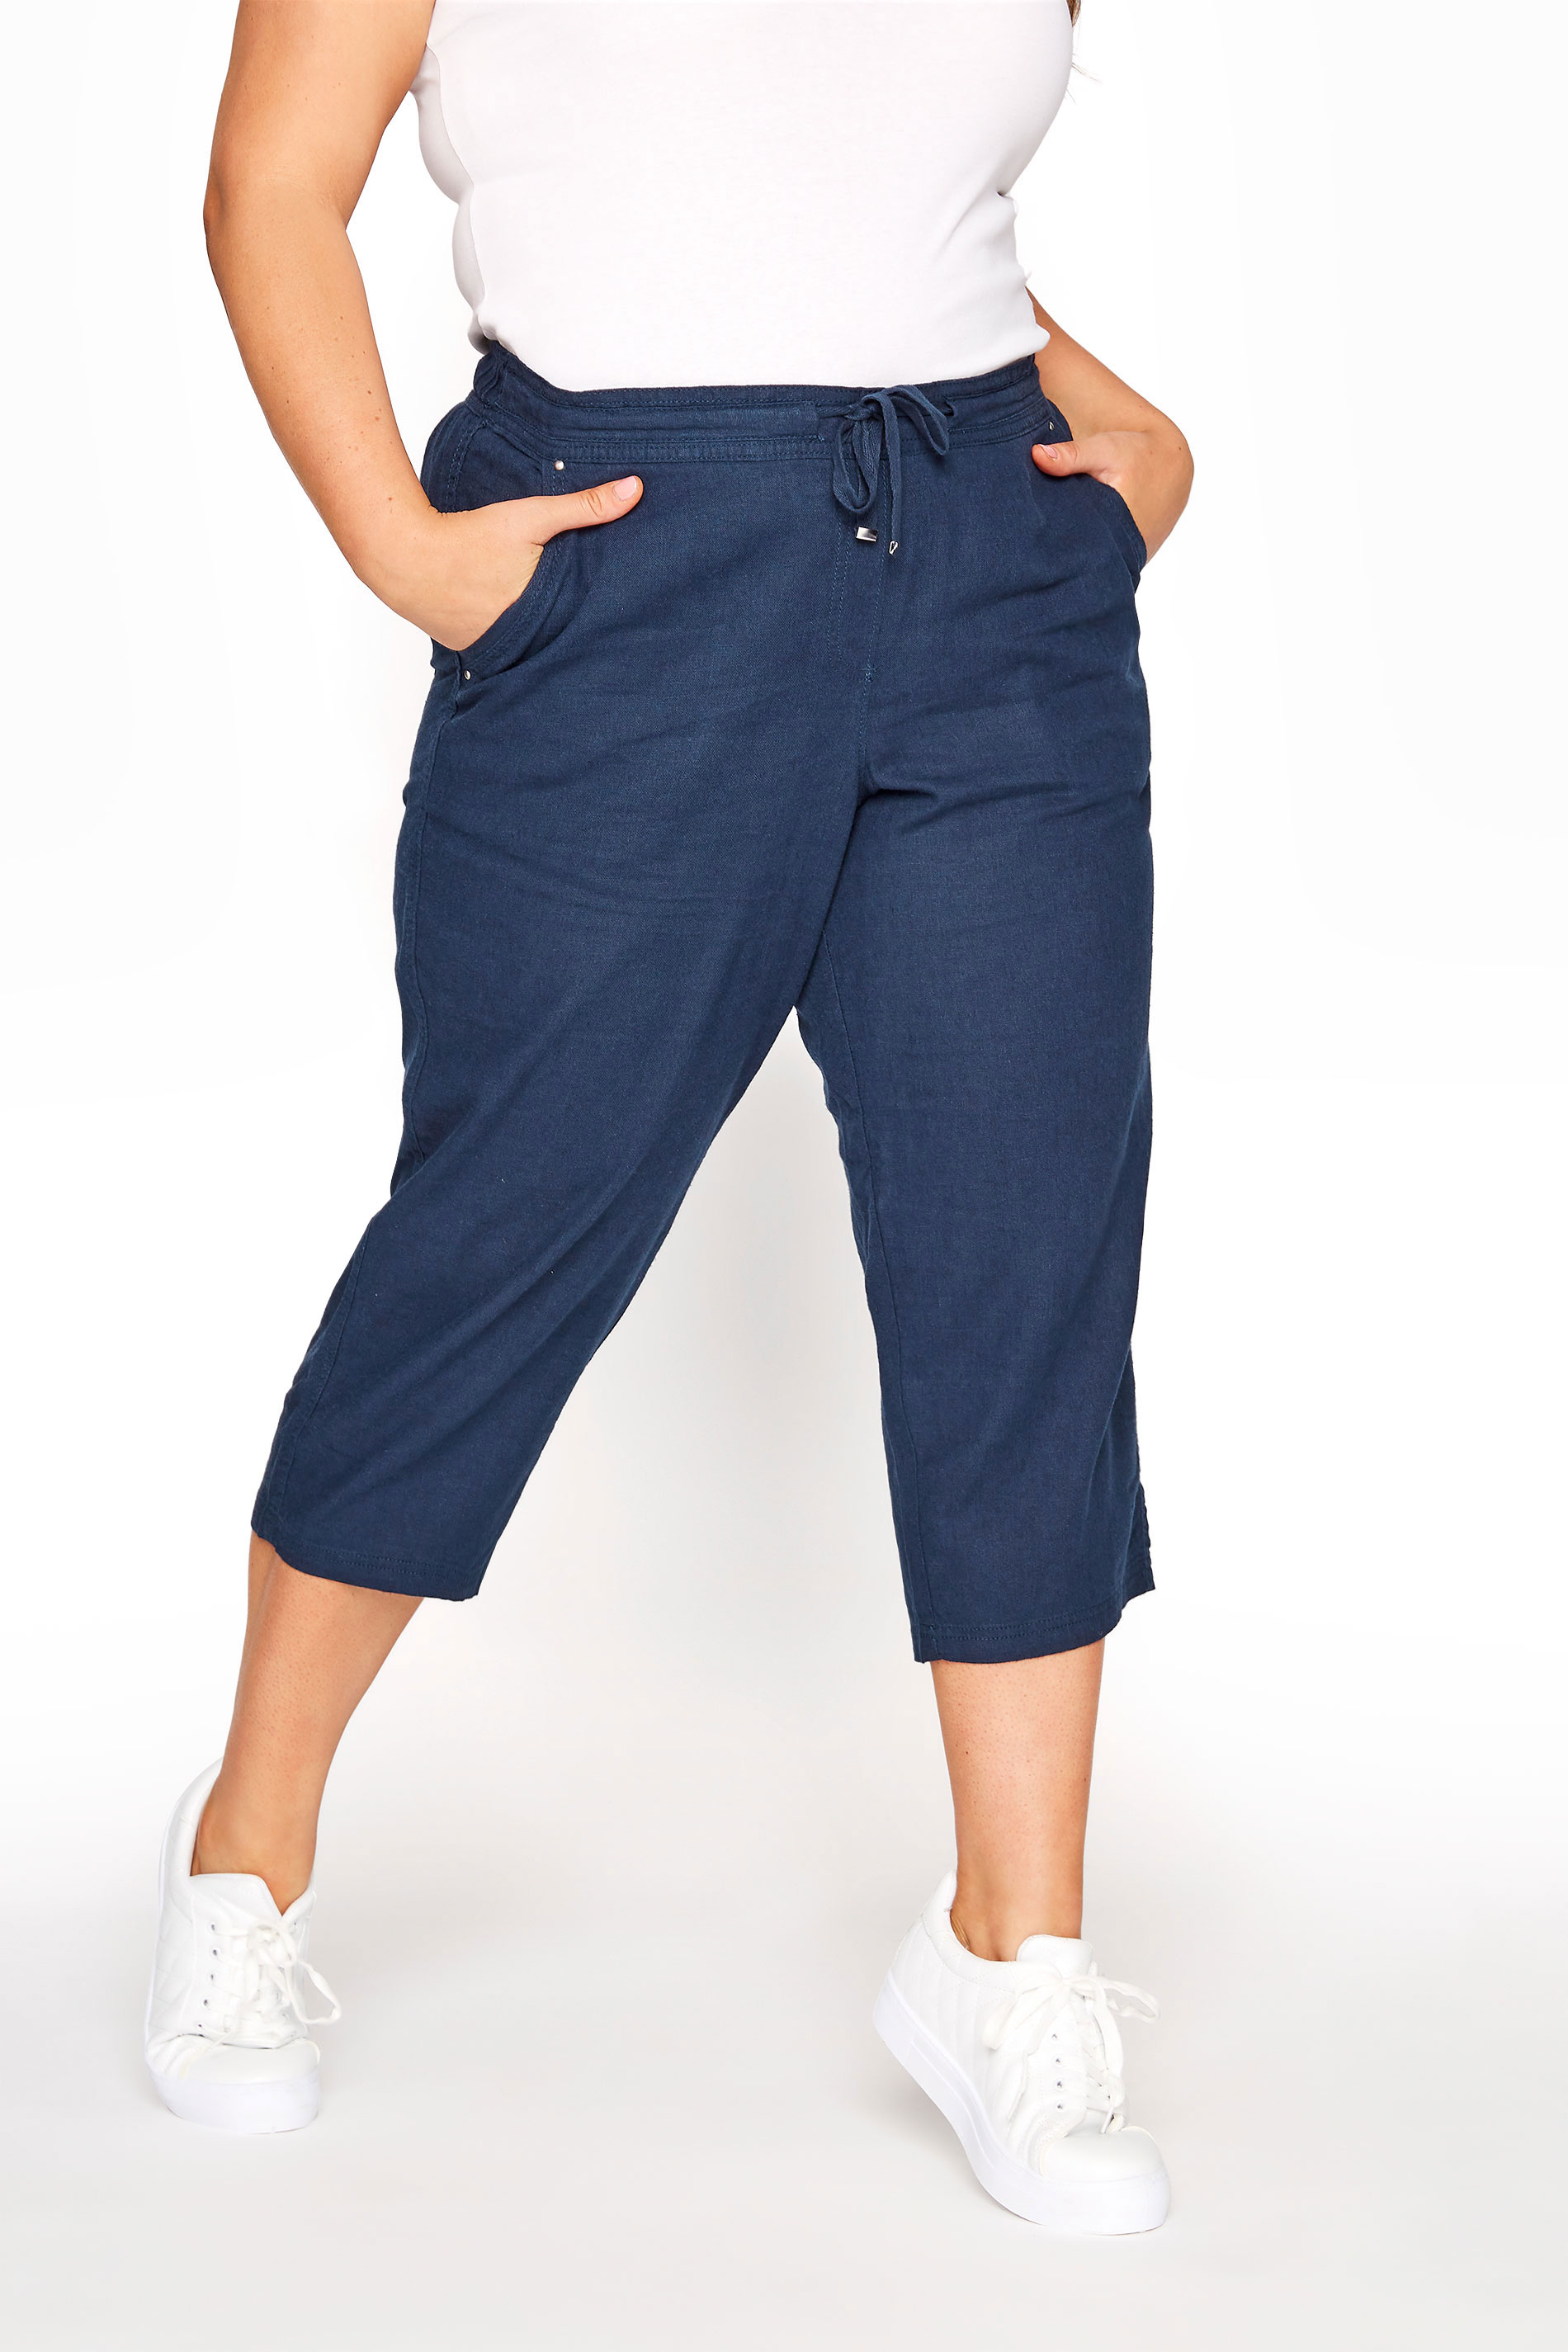 Navy Cropped Linen Mix Trousers_B.jpg